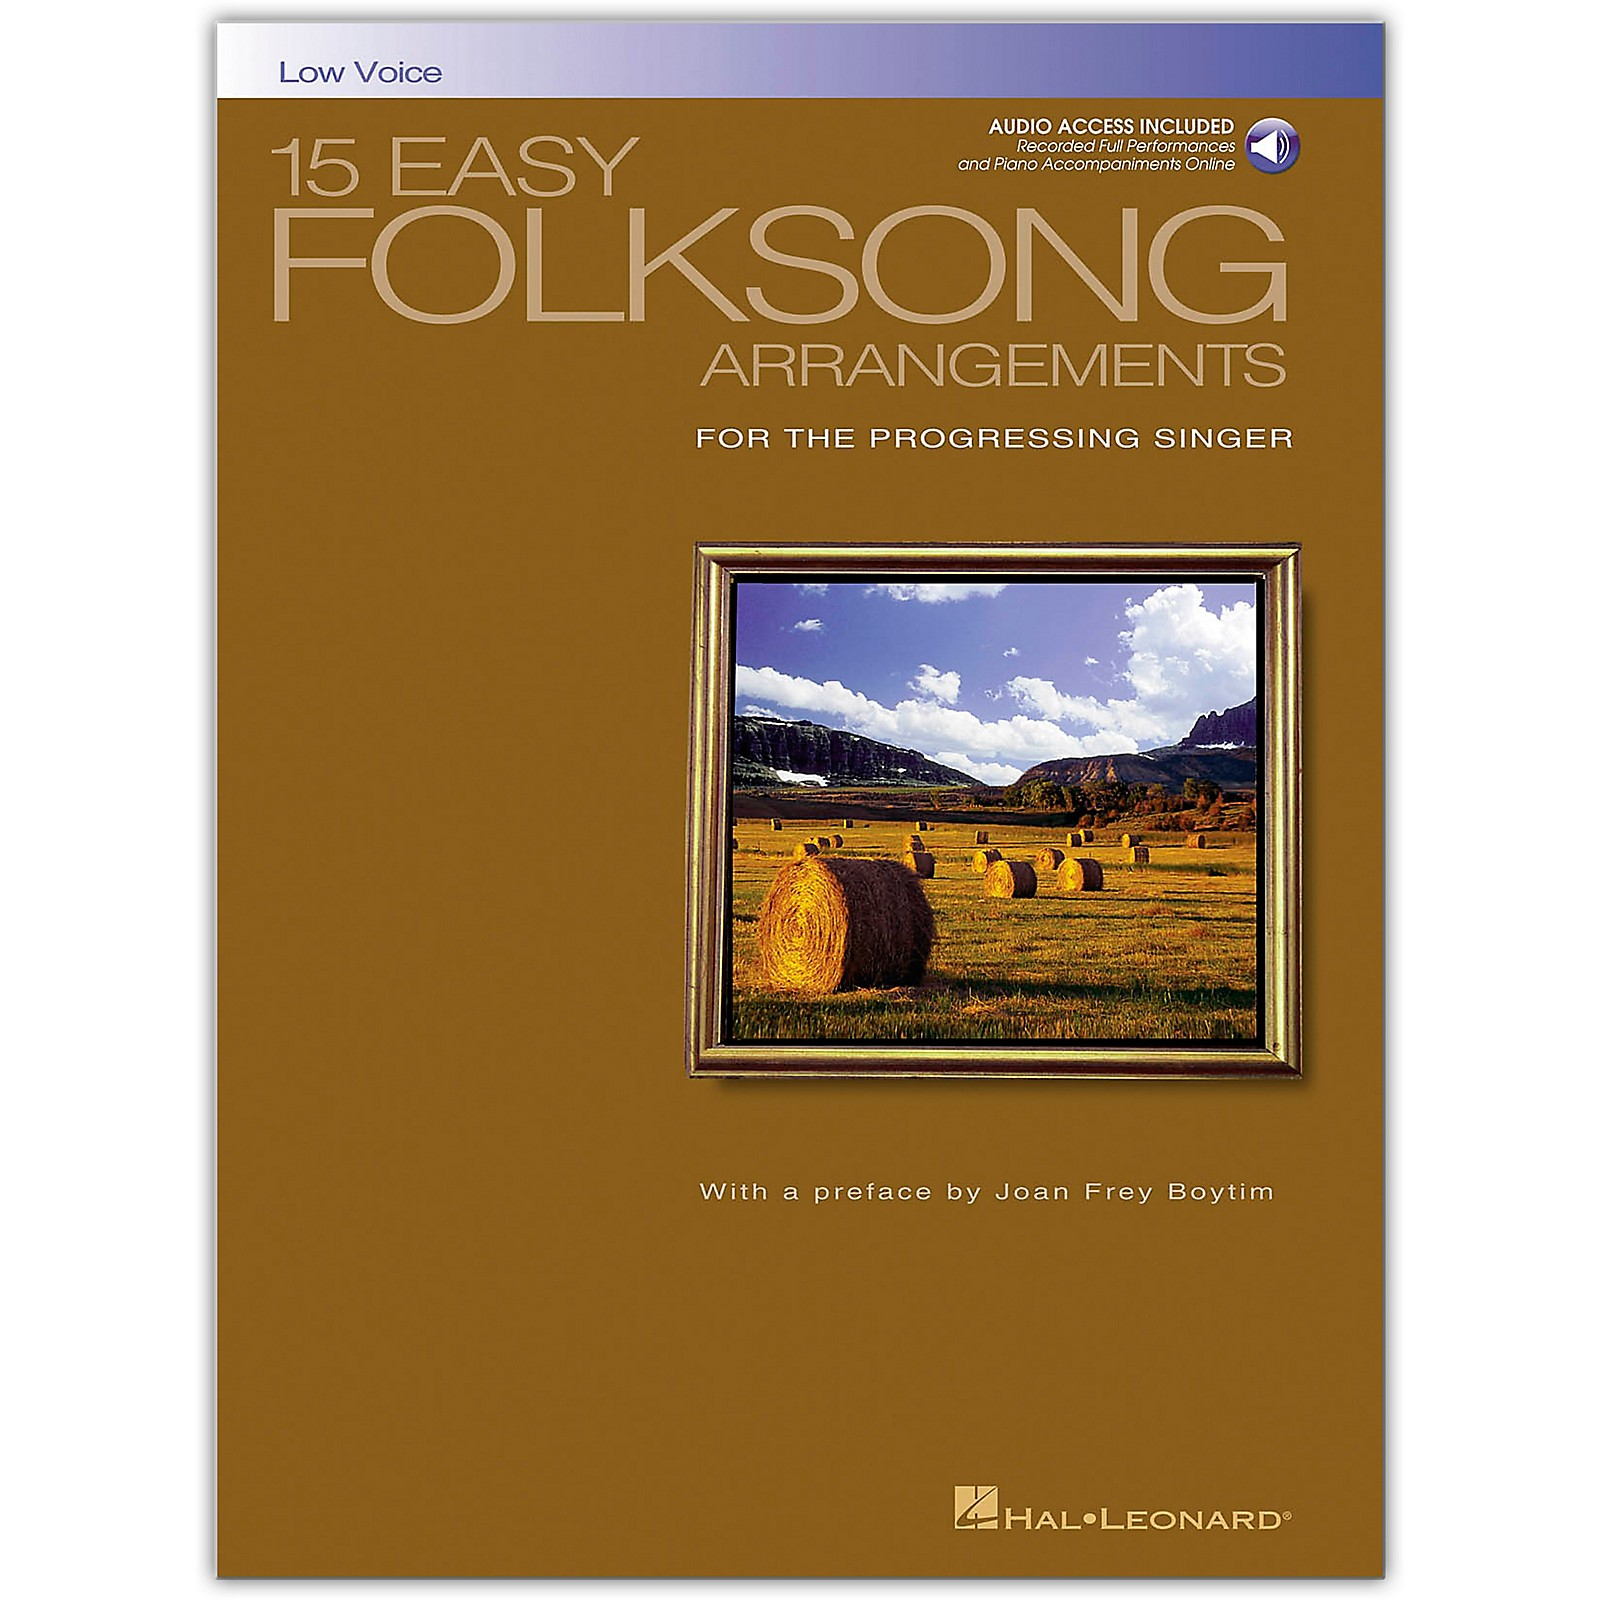 Hal Leonard 15 Easy Folksong Arrangements for Low Voice (Book/Online Audio)